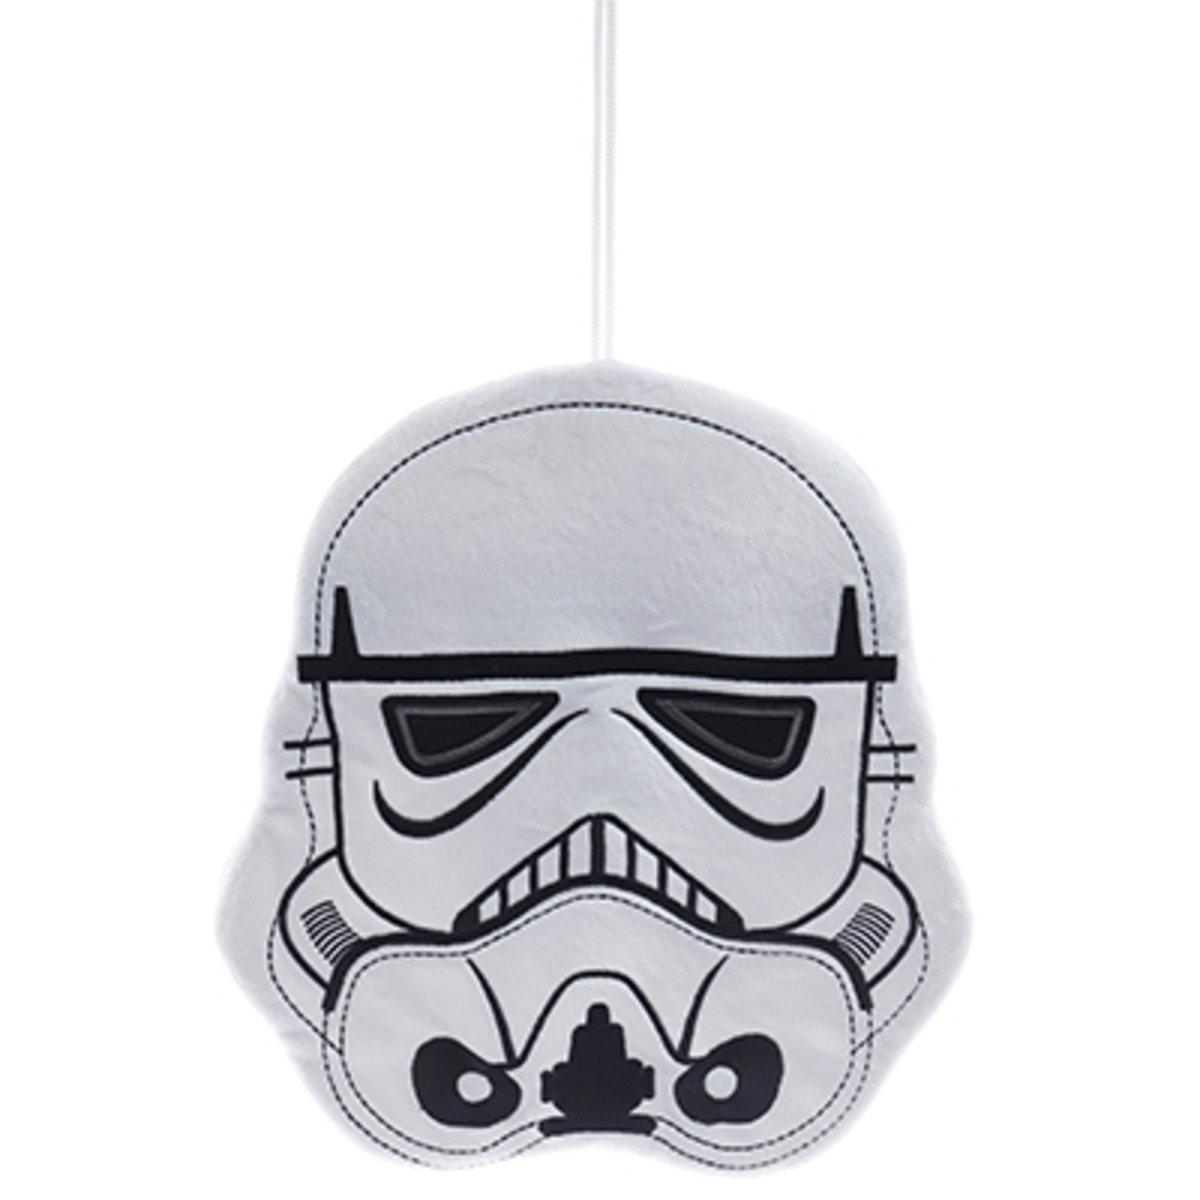 Star Wars暖水袋